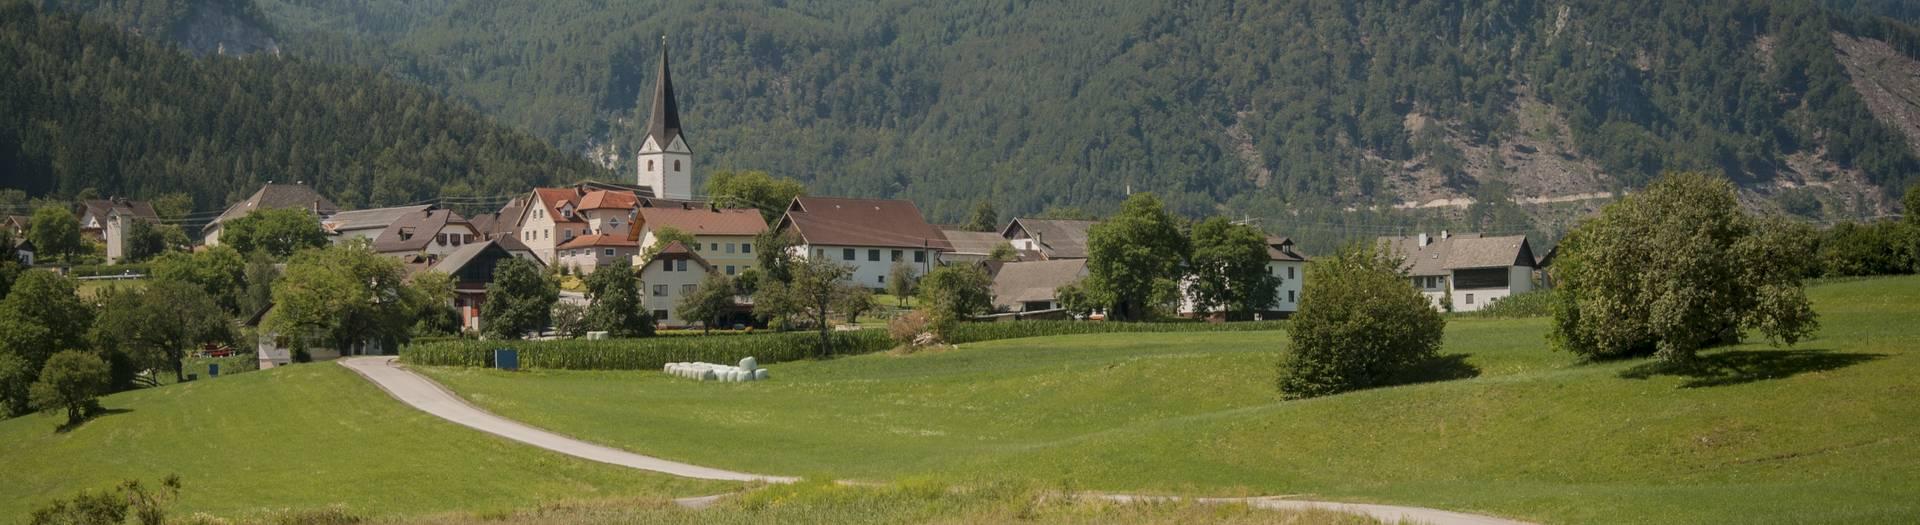 St. Margarethen im Rosental